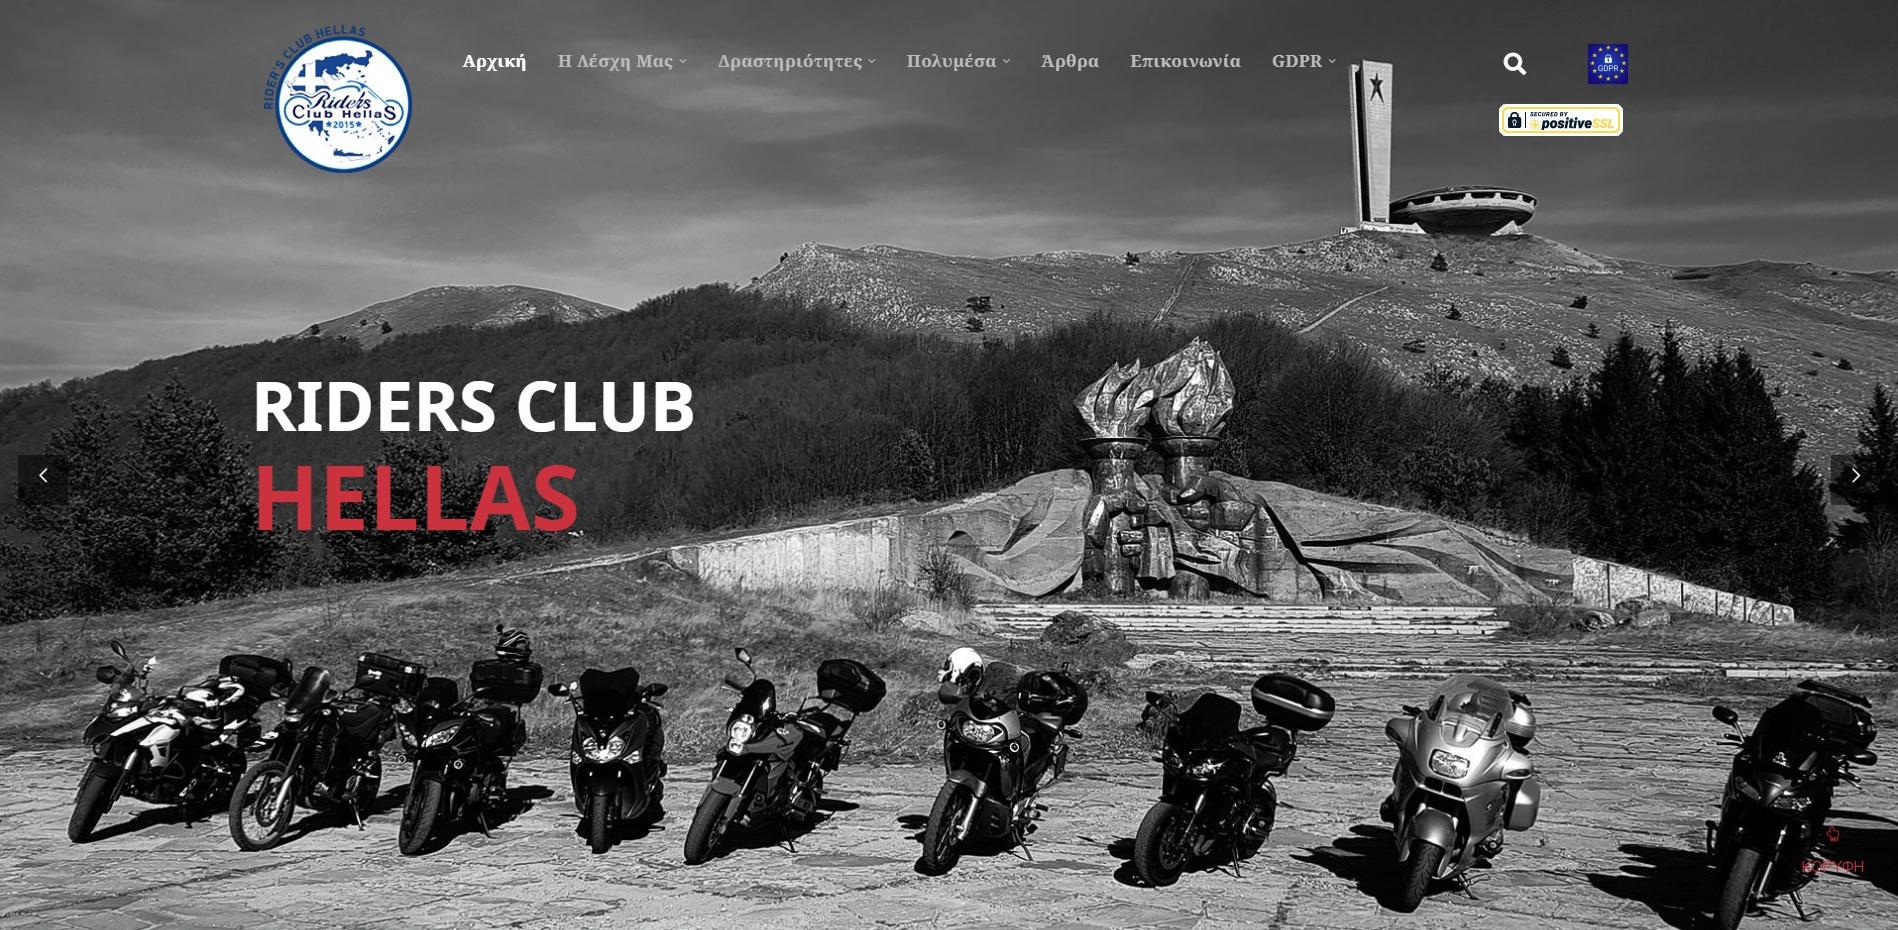 ridersclubhellas.gr – Νέα Ιστοσελίδα στο χώρο λέσχης μοτοσυκλέτας από τη VisionCA